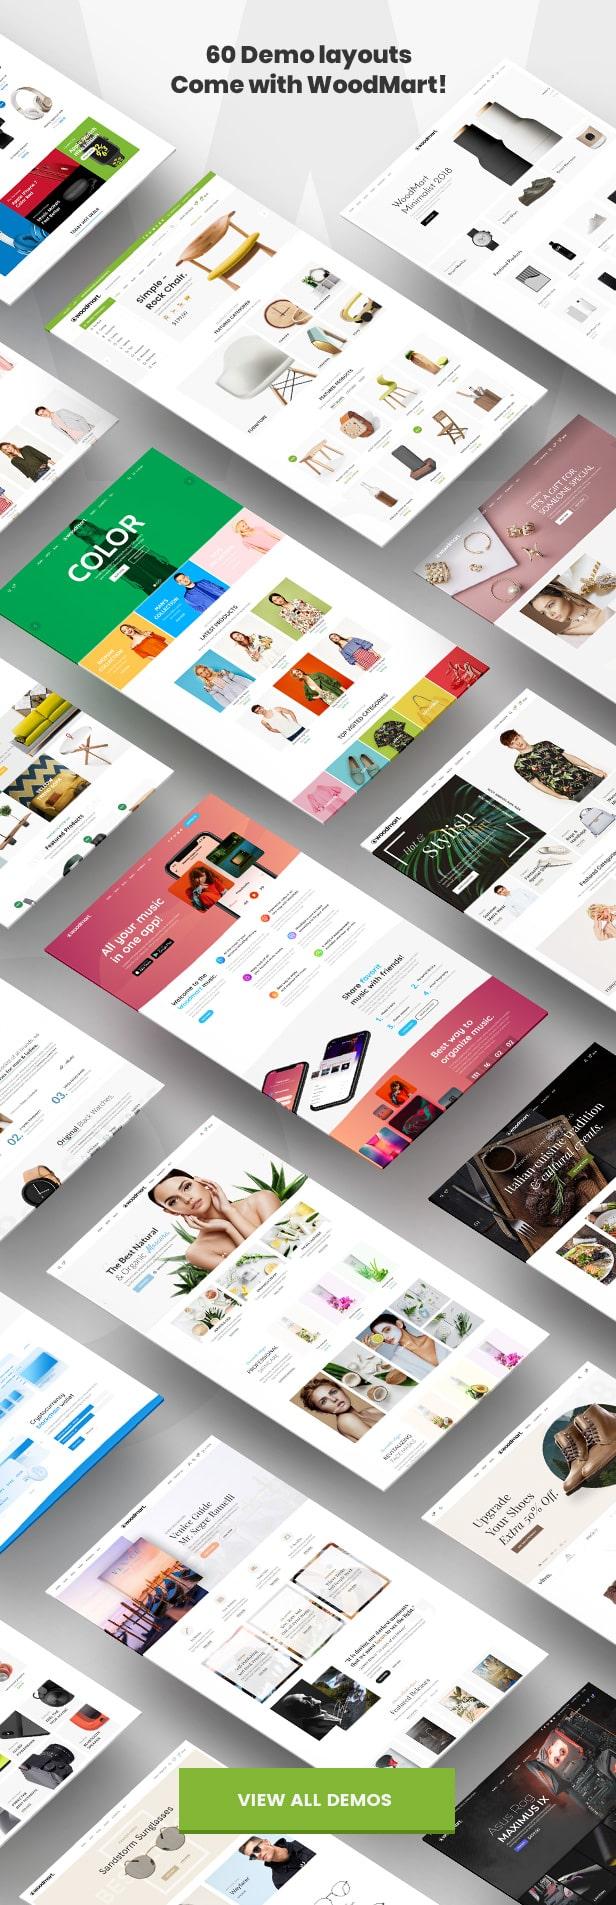 demos 60 - WoodMart - Responsive WooCommerce WordPress Theme